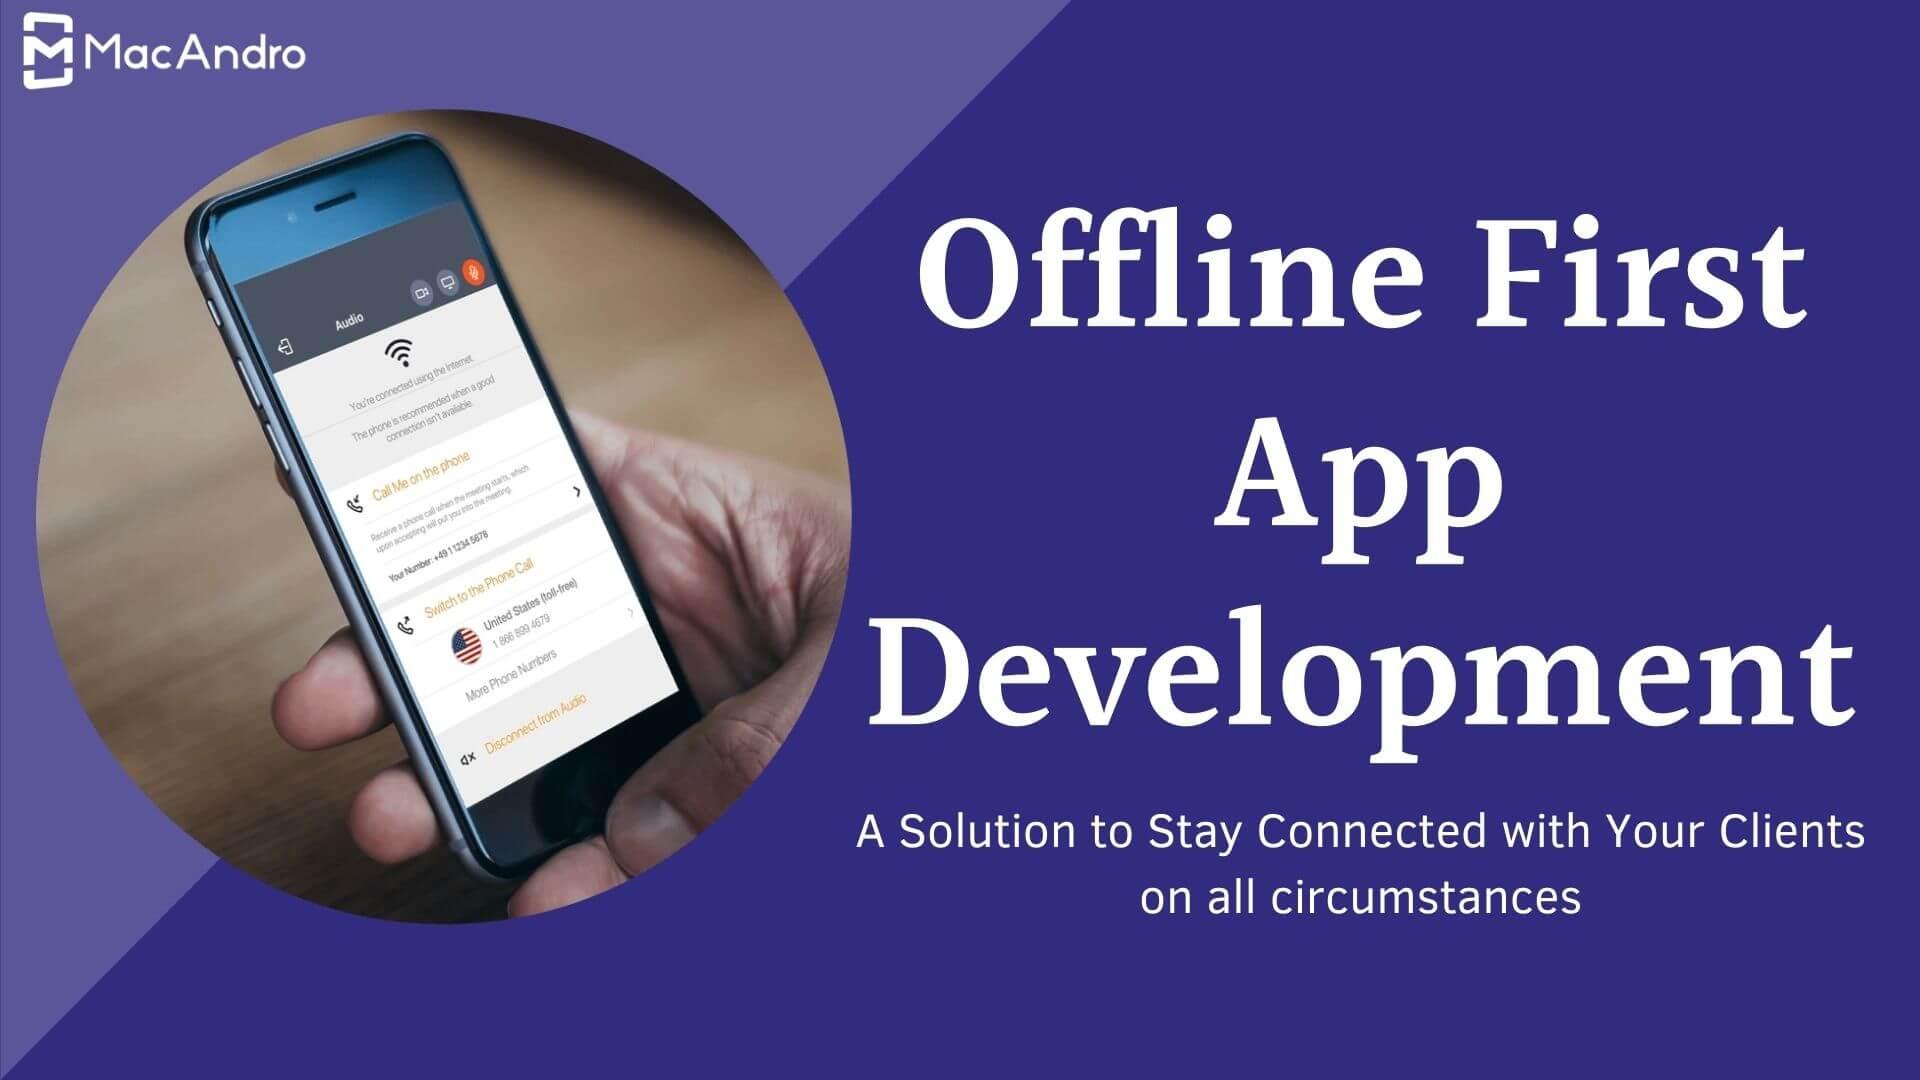 Offline First Mobile App Development - Build Apps That Works Beyond The Internet